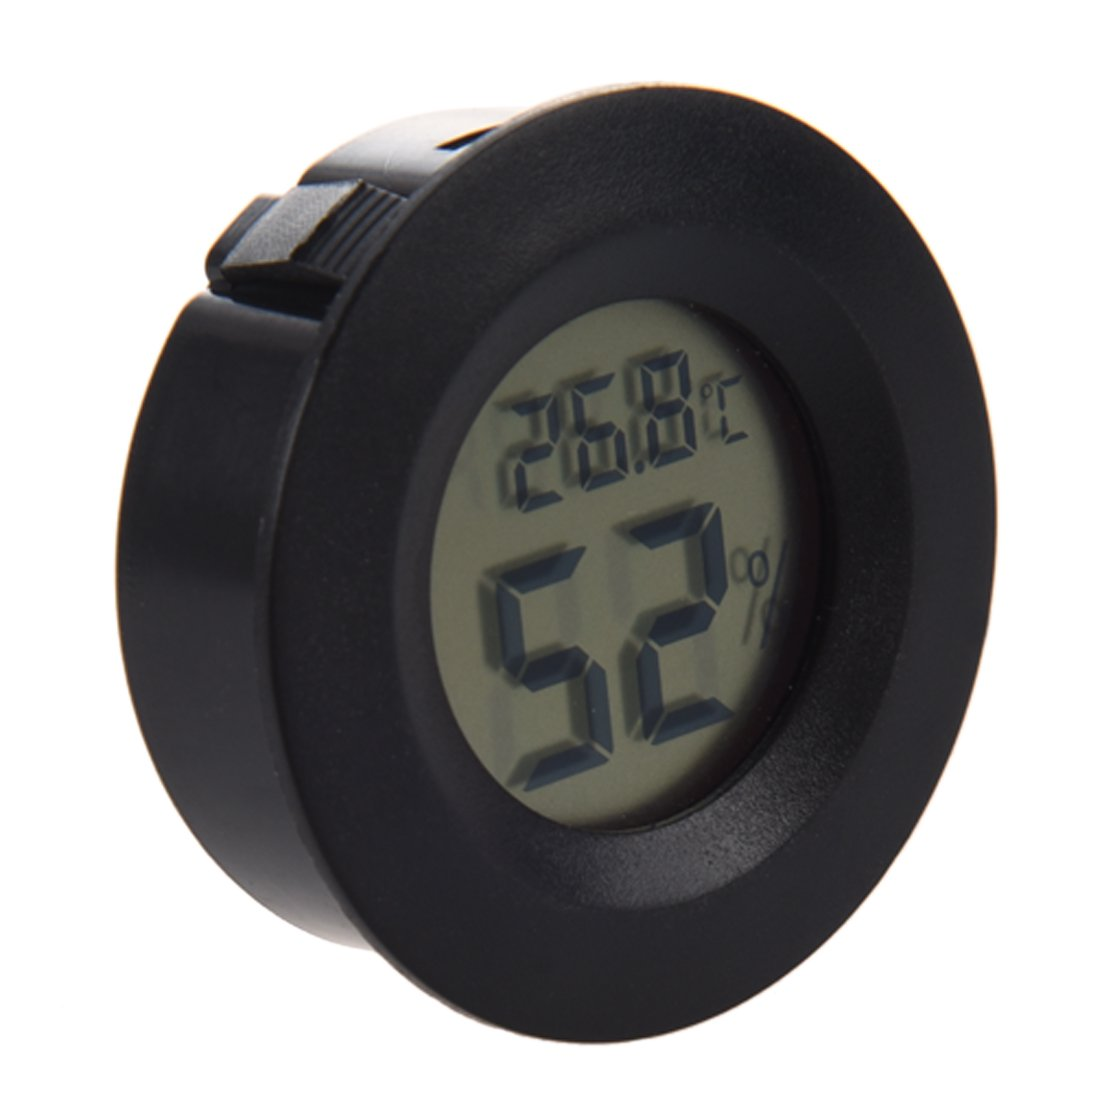 Thermometre - TOOGOO(R) Thermometre numerique Mini hygrometre hygrometre Celsius celsius (Noir)